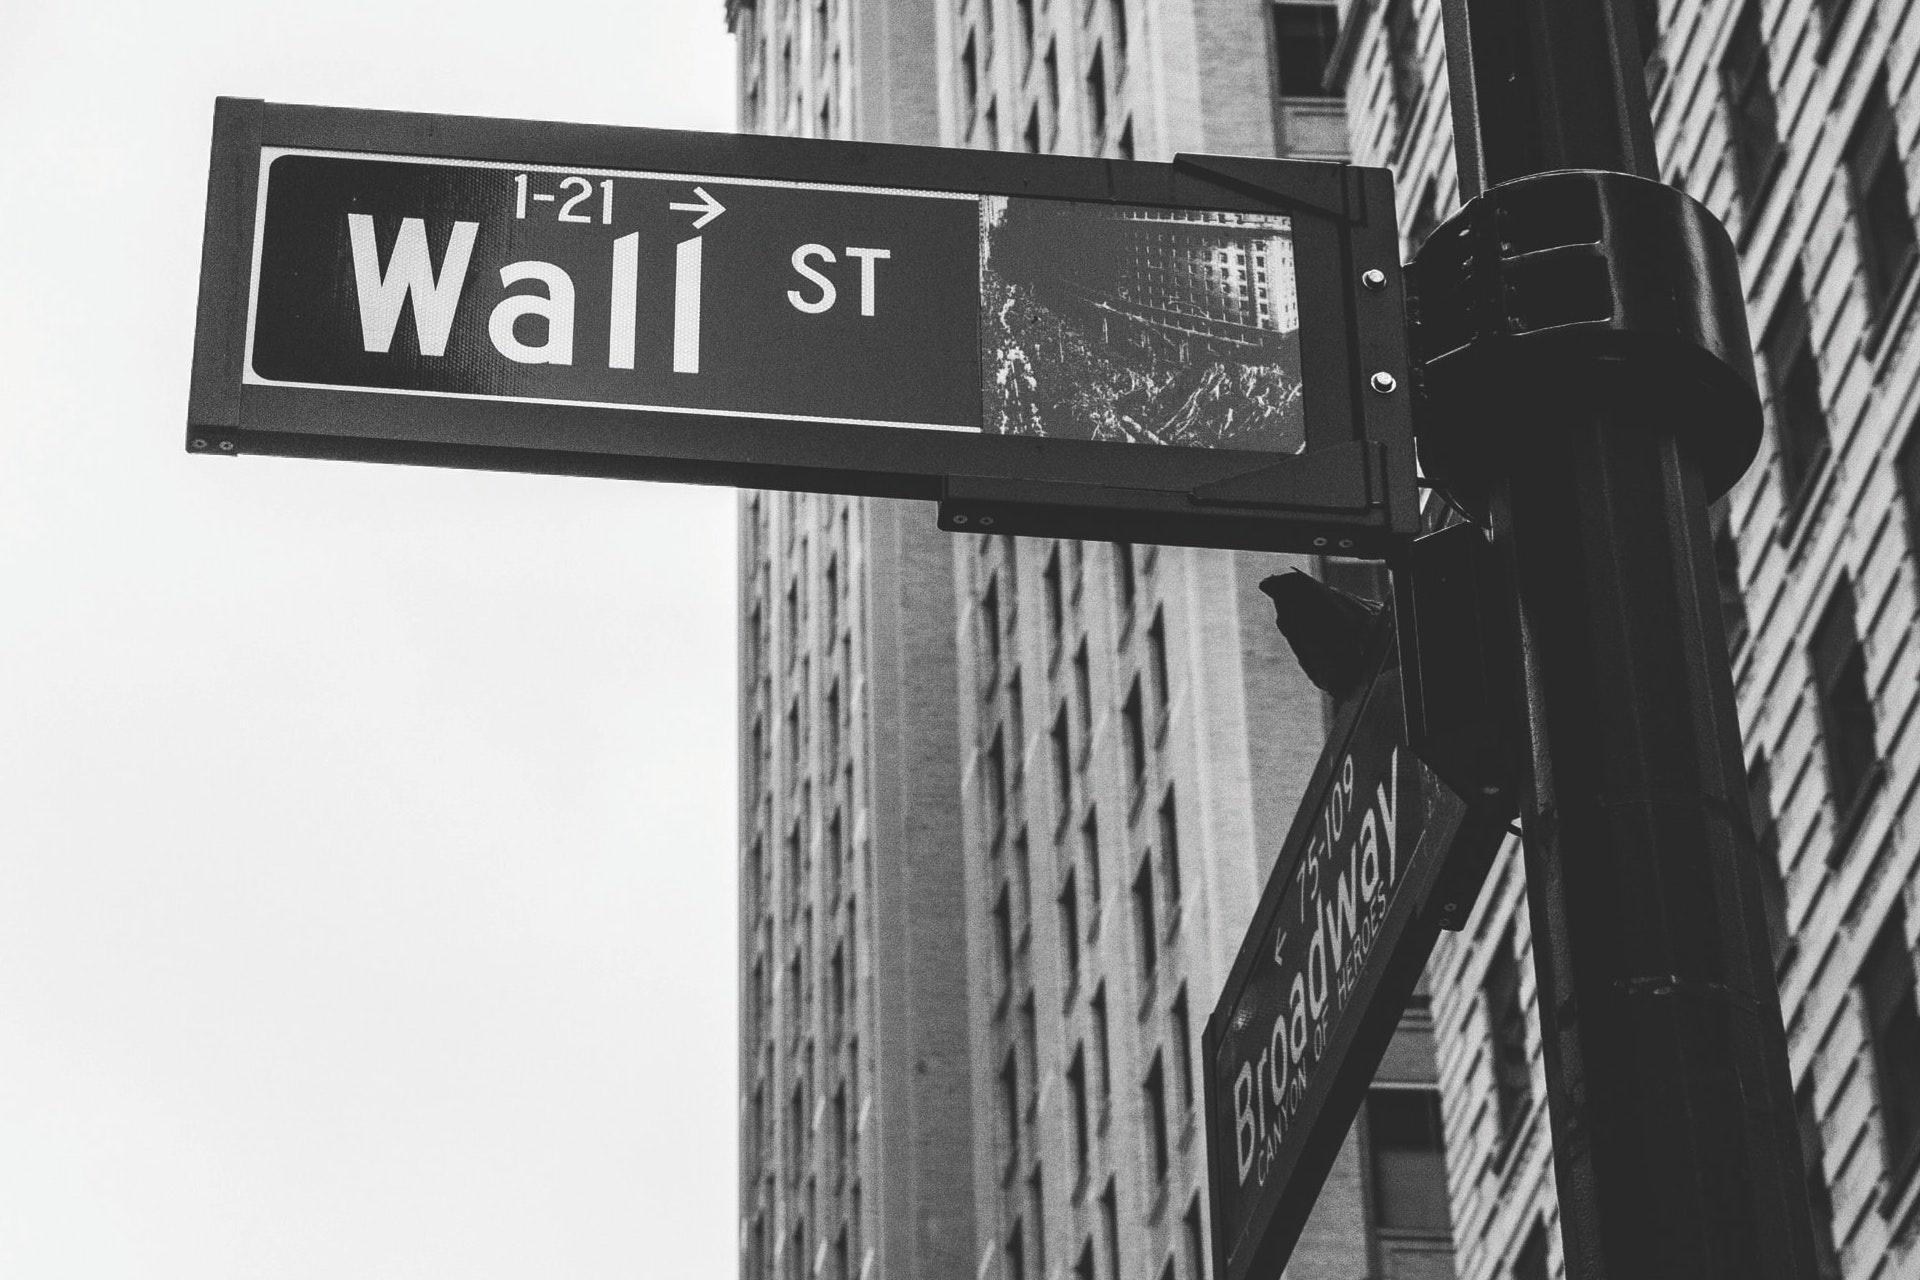 Wall Street Hedge Funds